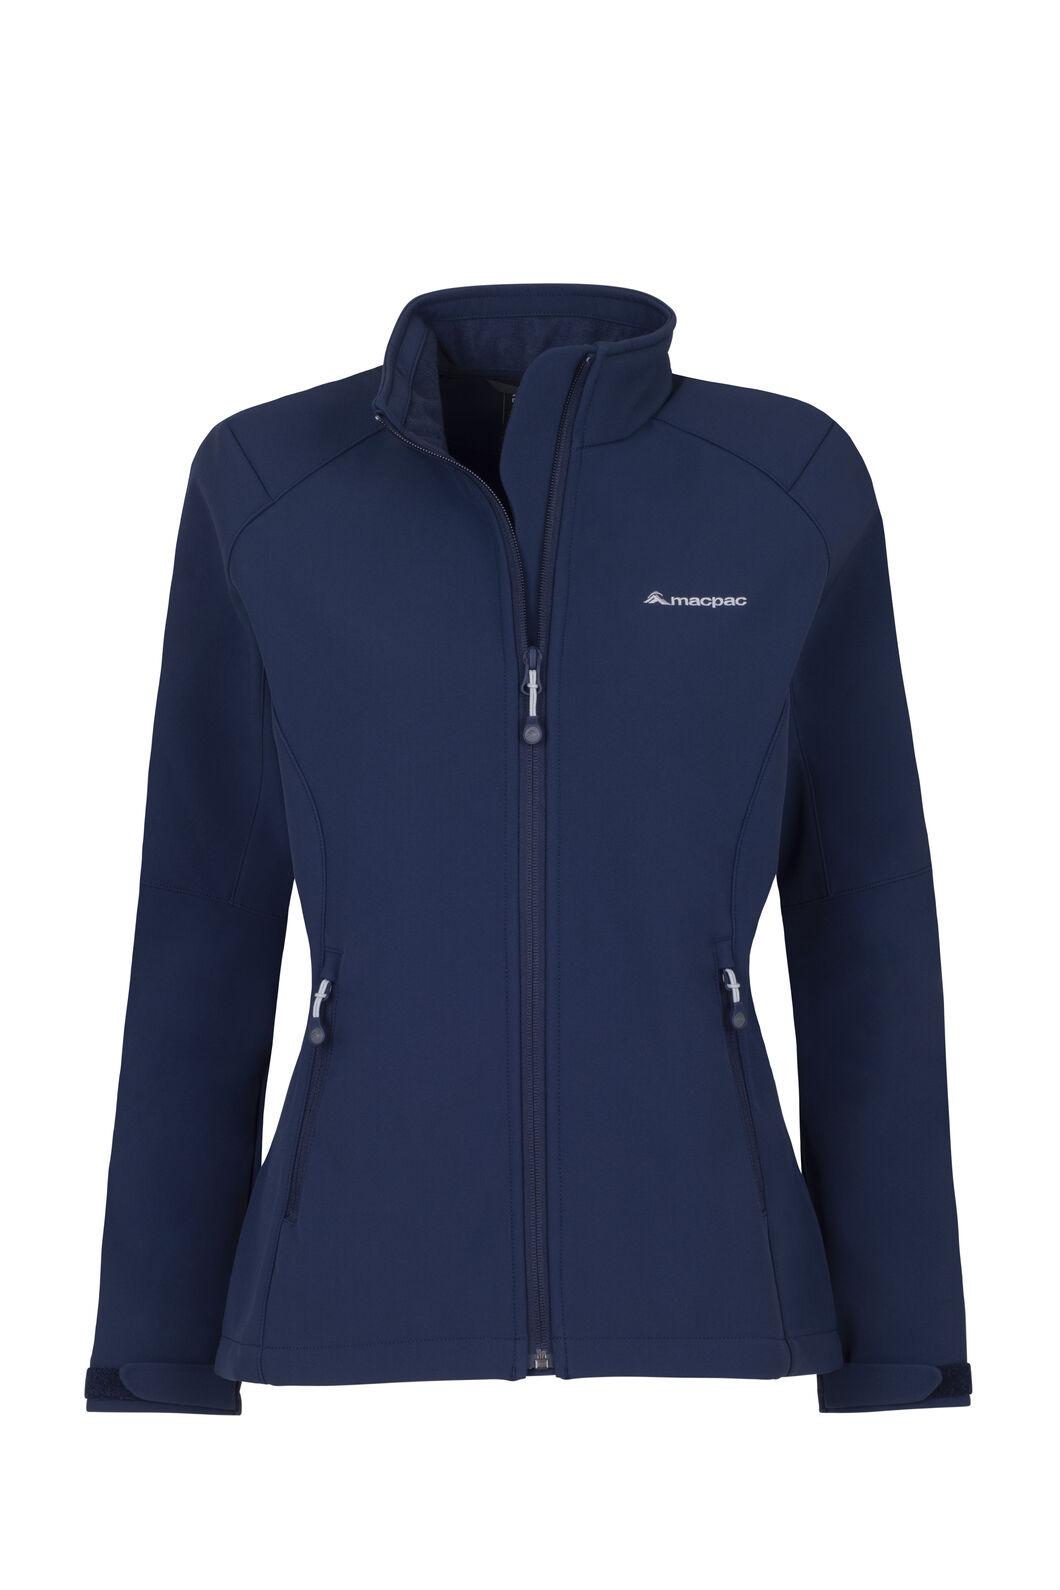 Macpac Sabre Softshell Jacket - Women's, Black Iris, hi-res